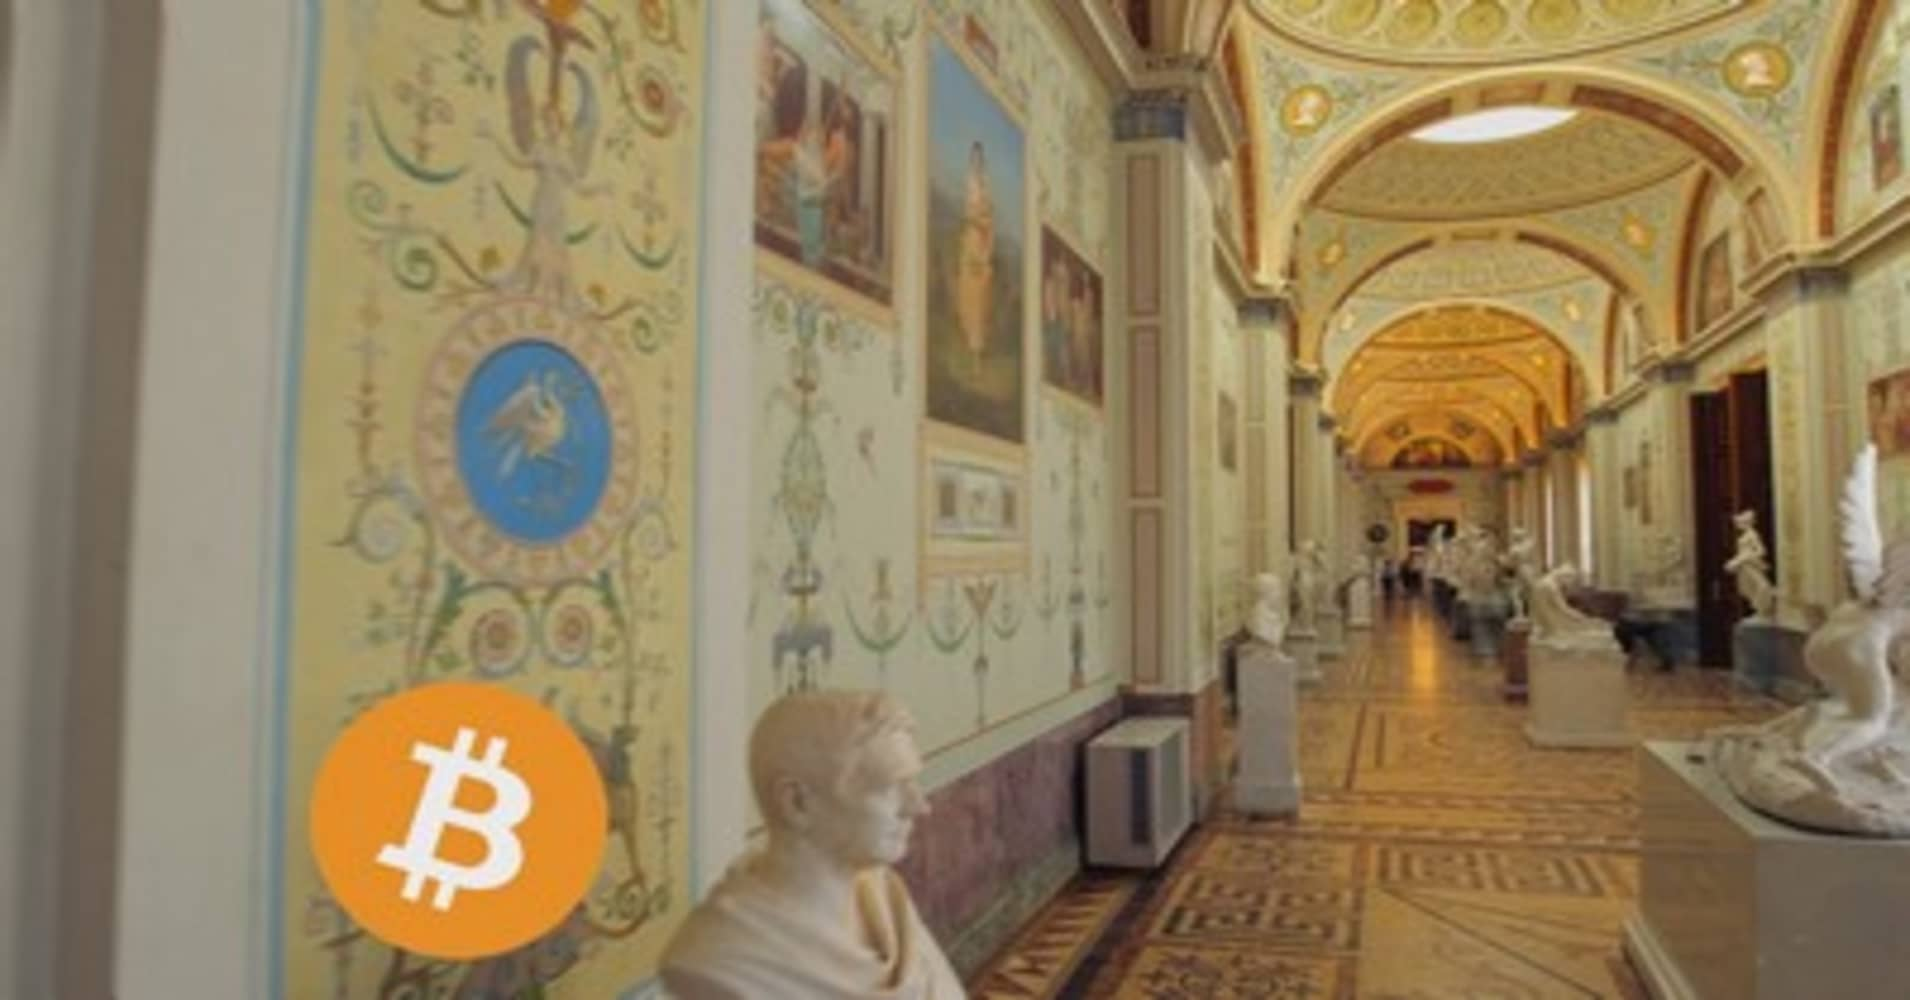 Bitcoin is disrupting the $45 billion art industry